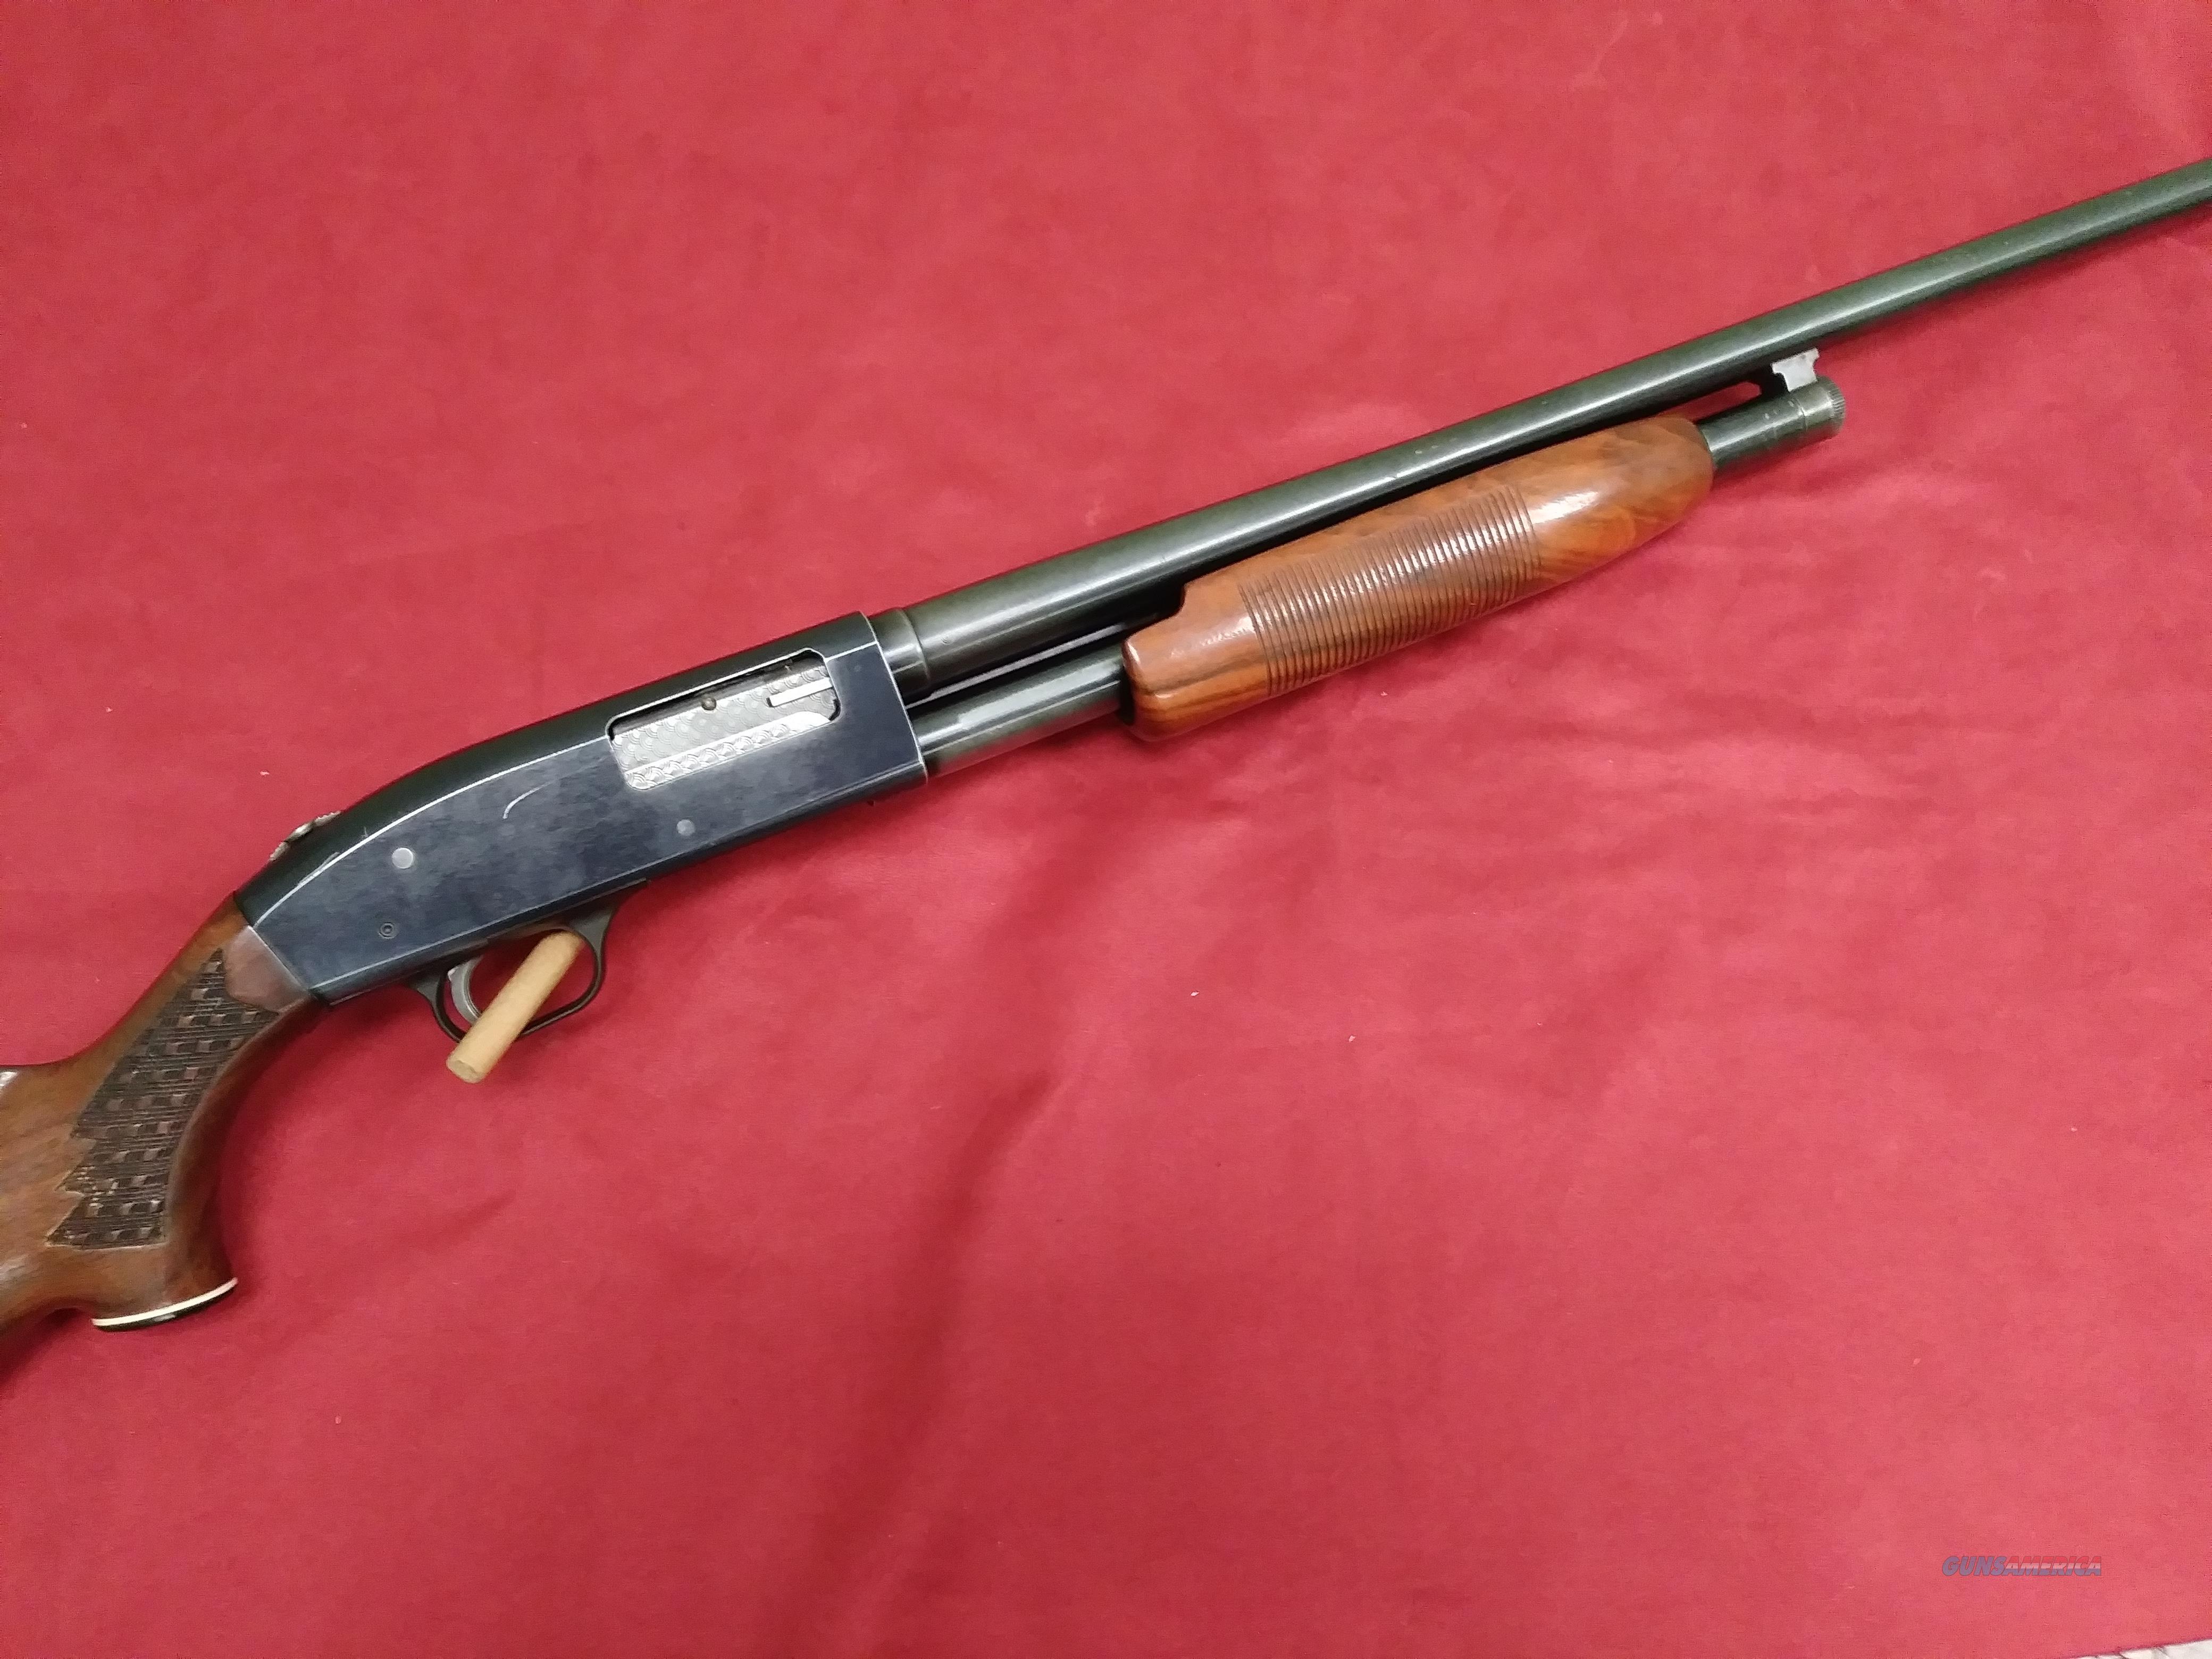 Mossberg 500A 12ga  Guns > Shotguns > Mossberg Shotguns > Pump > Tactical